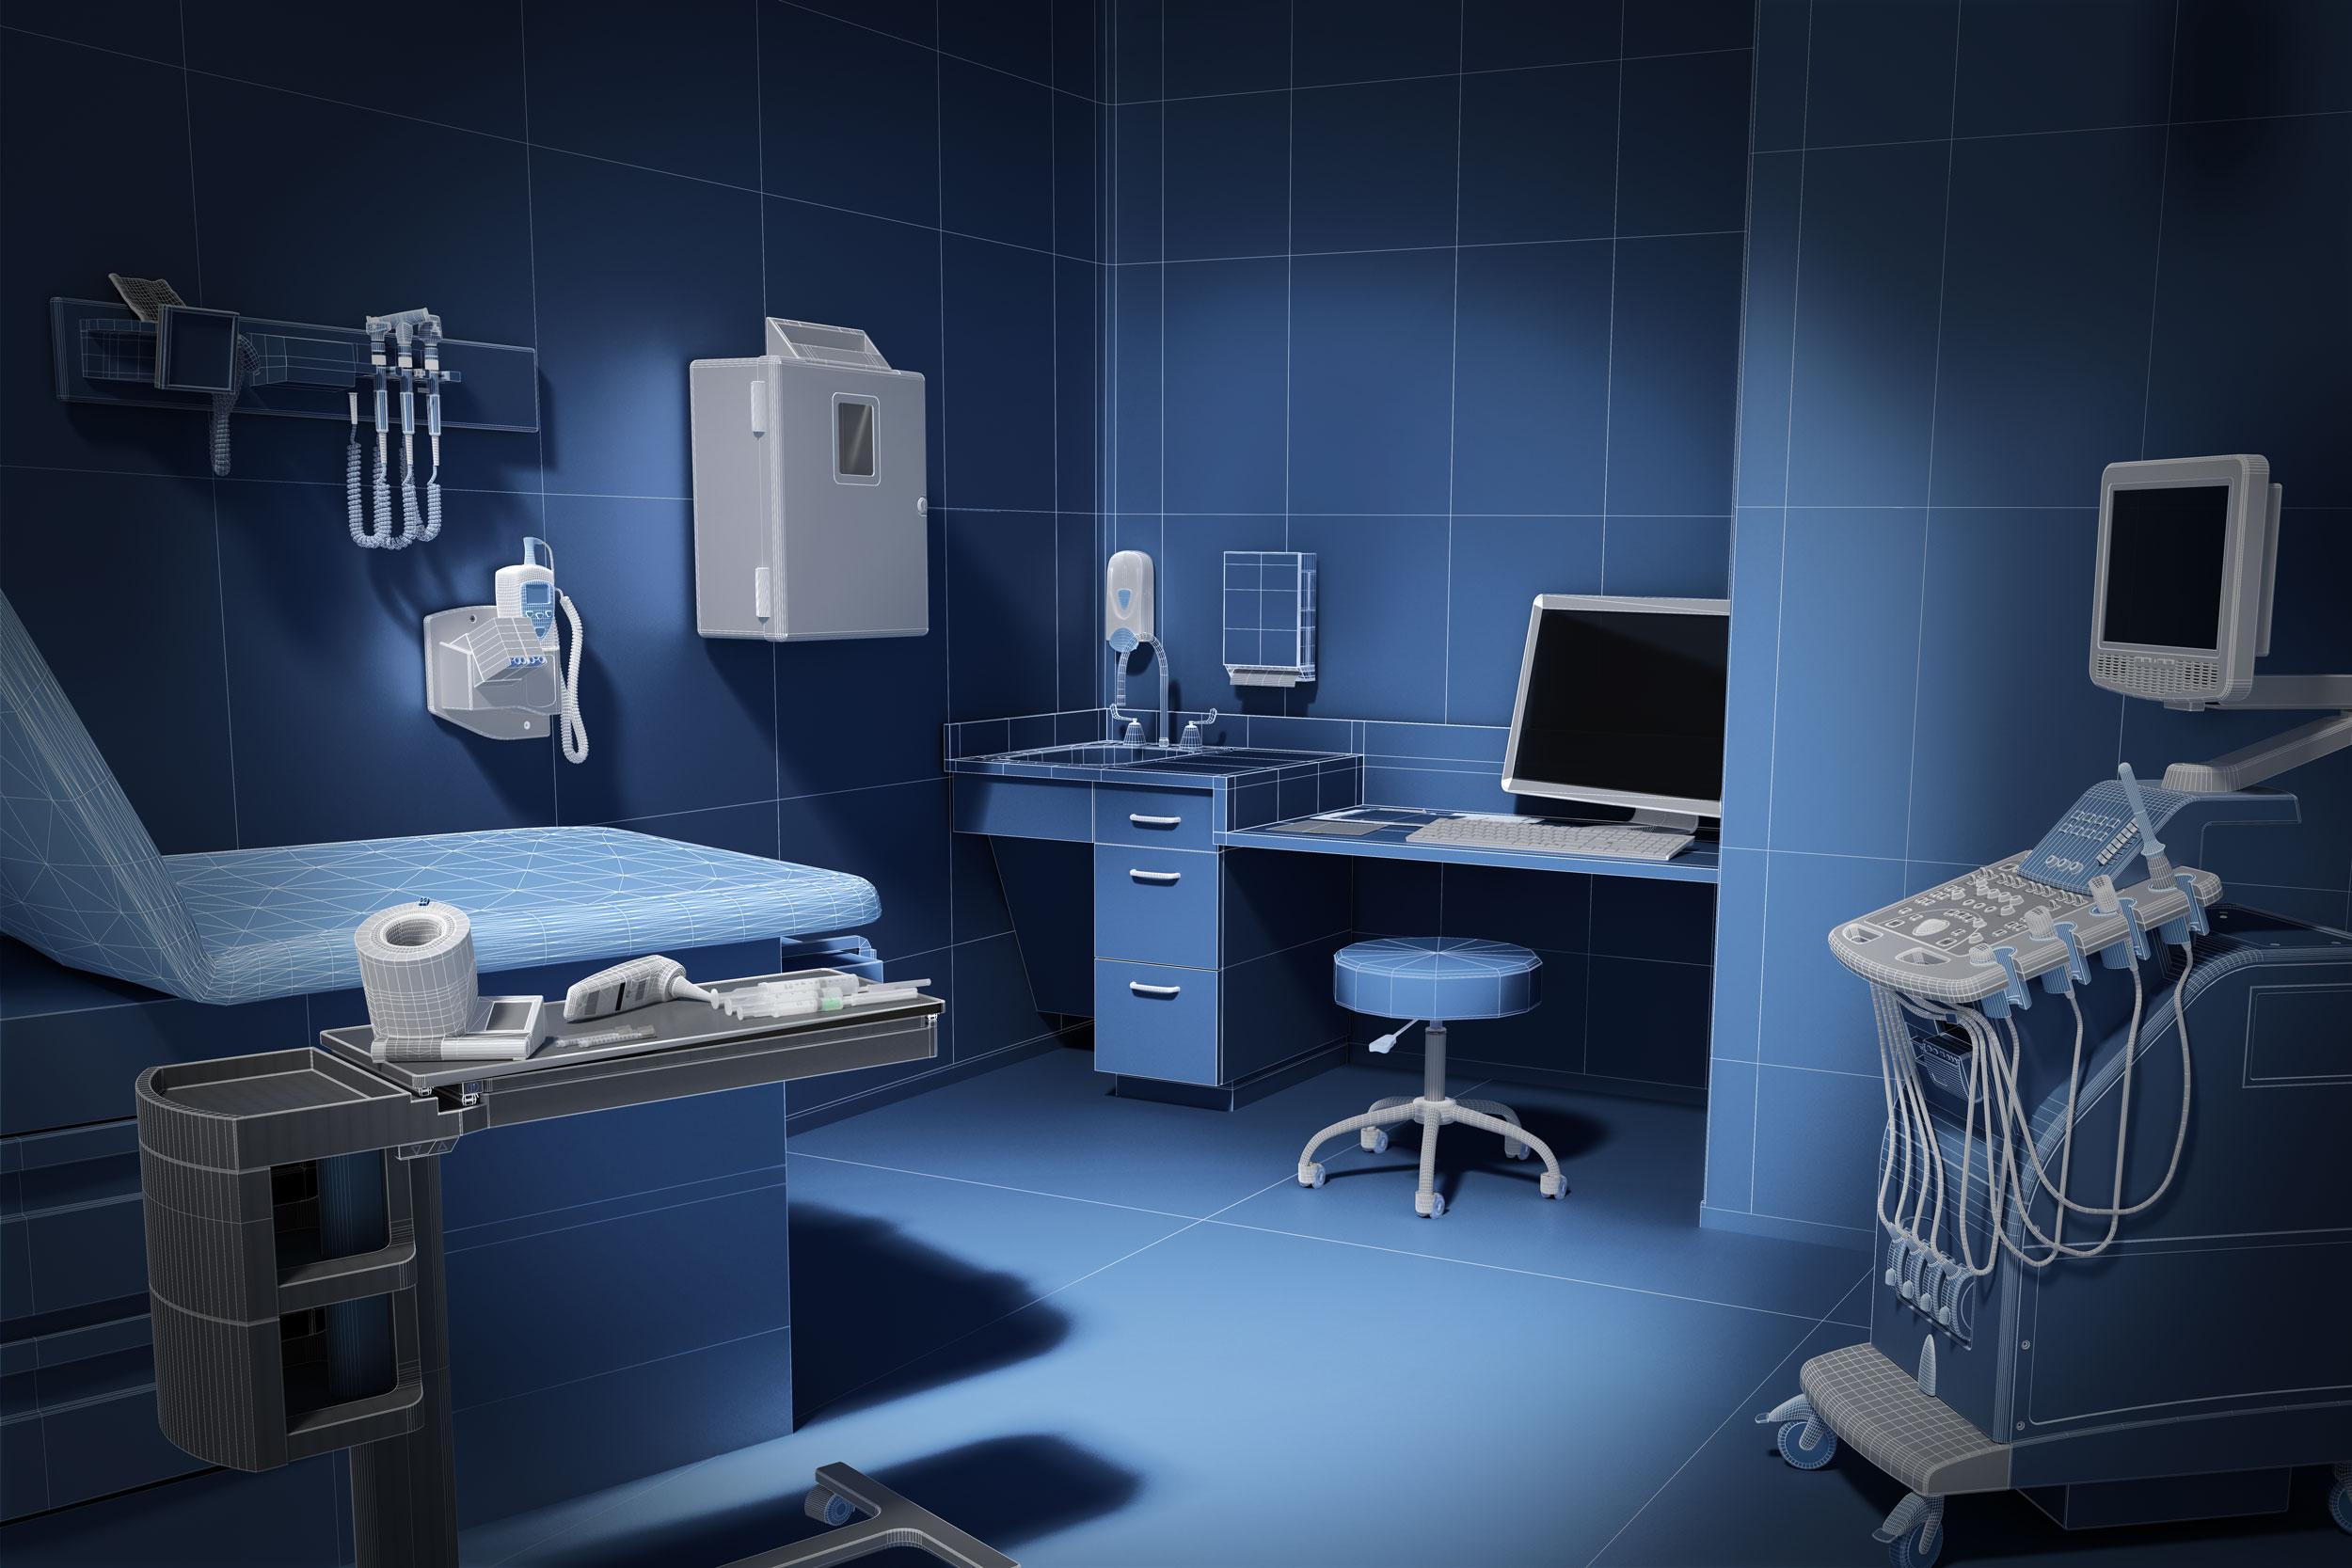 cgi blueprint image of doctors office